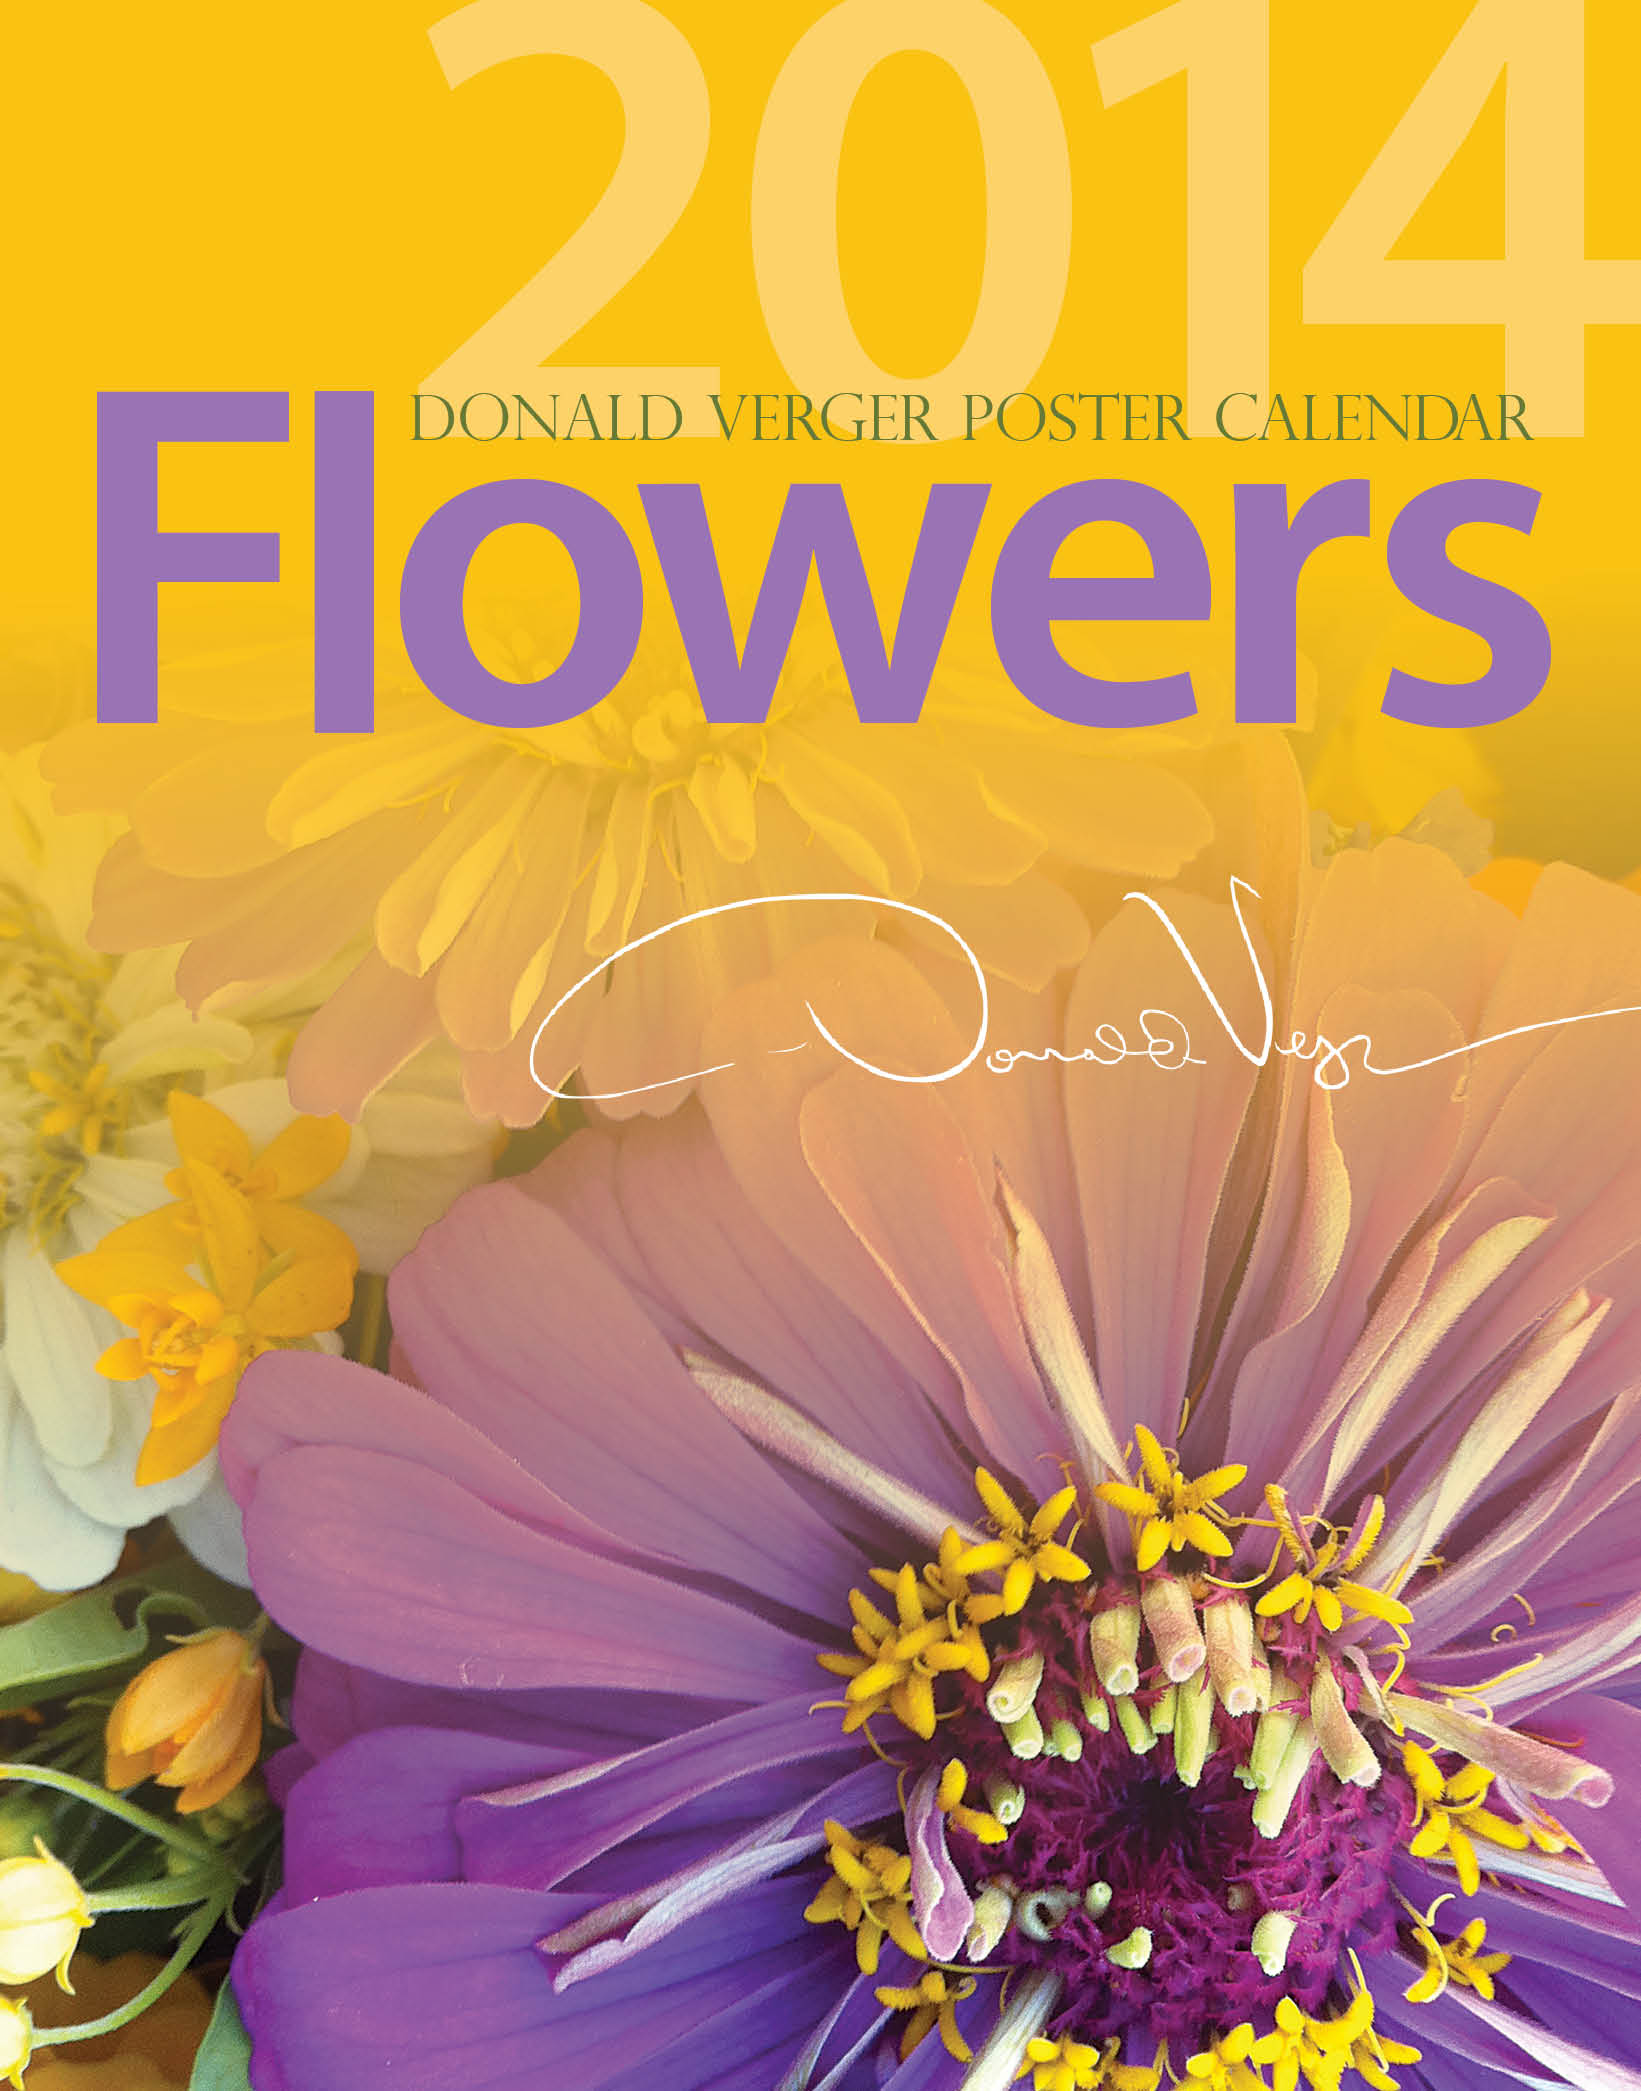 dv poll 2014_PosterCalendar_Flowers_cover5